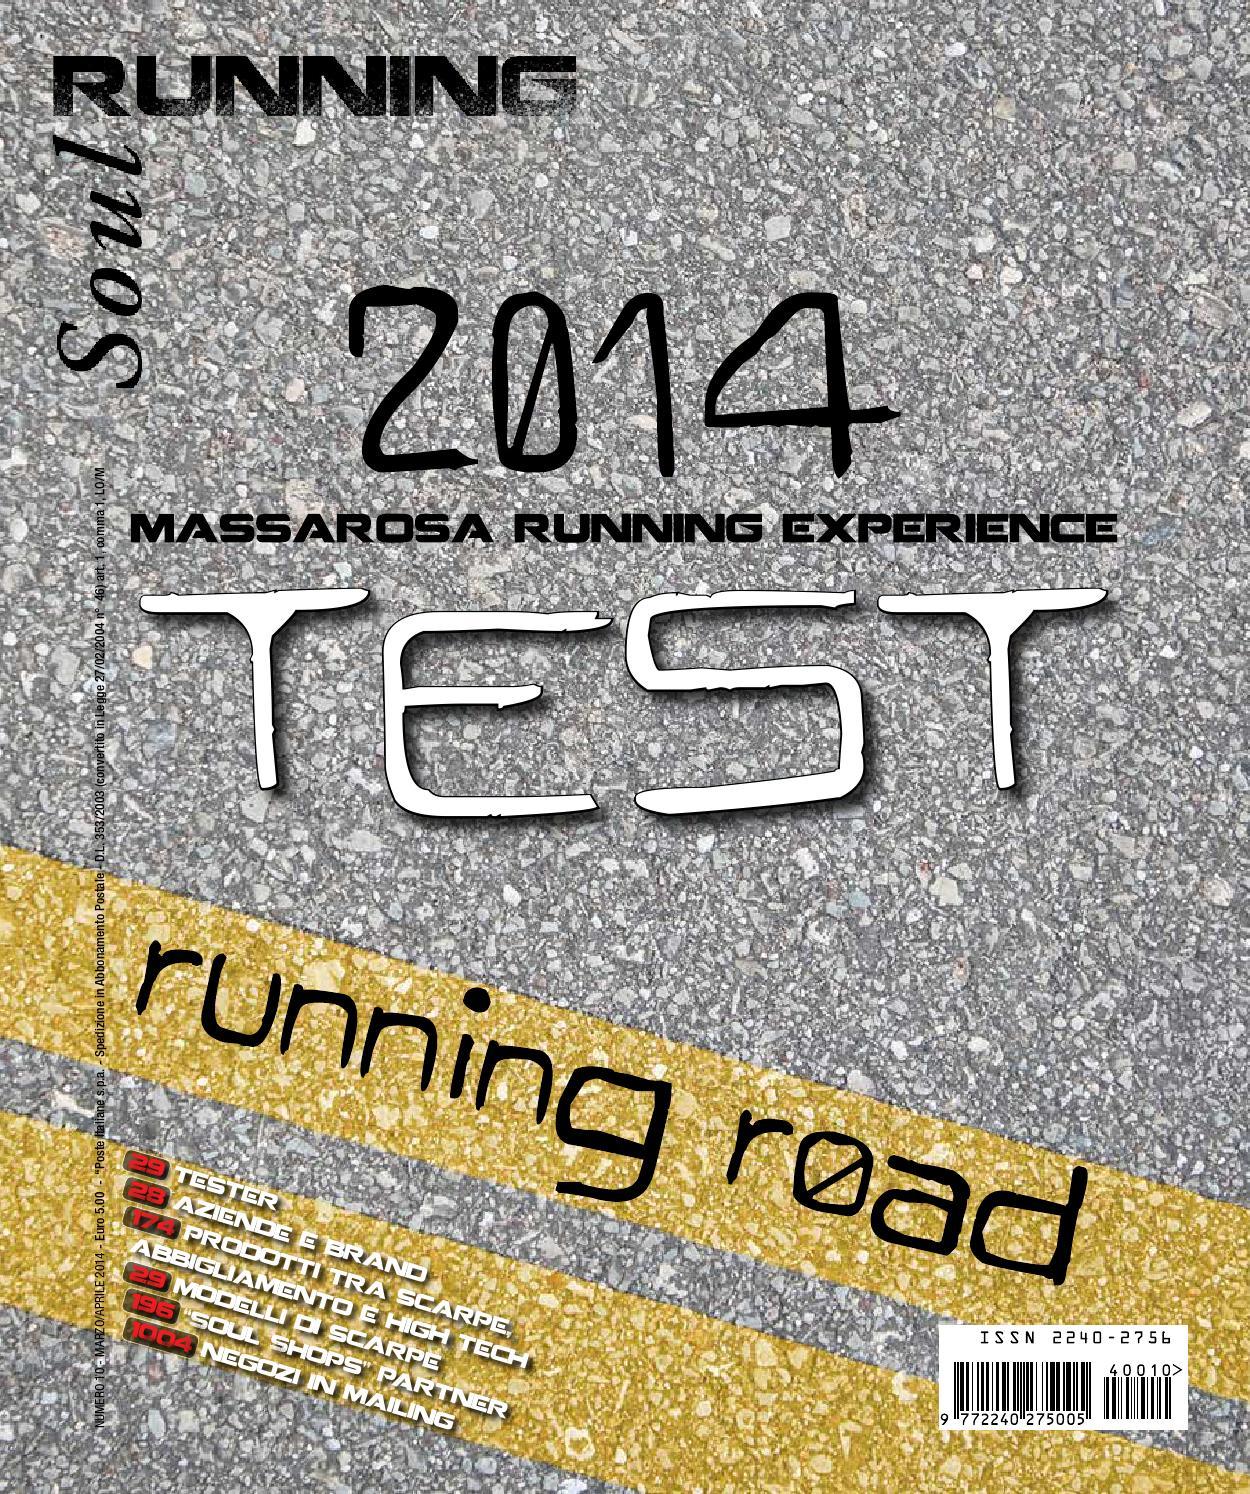 Guida TEST road 2014 by SoulRunning - issuu 3028c1e1e77